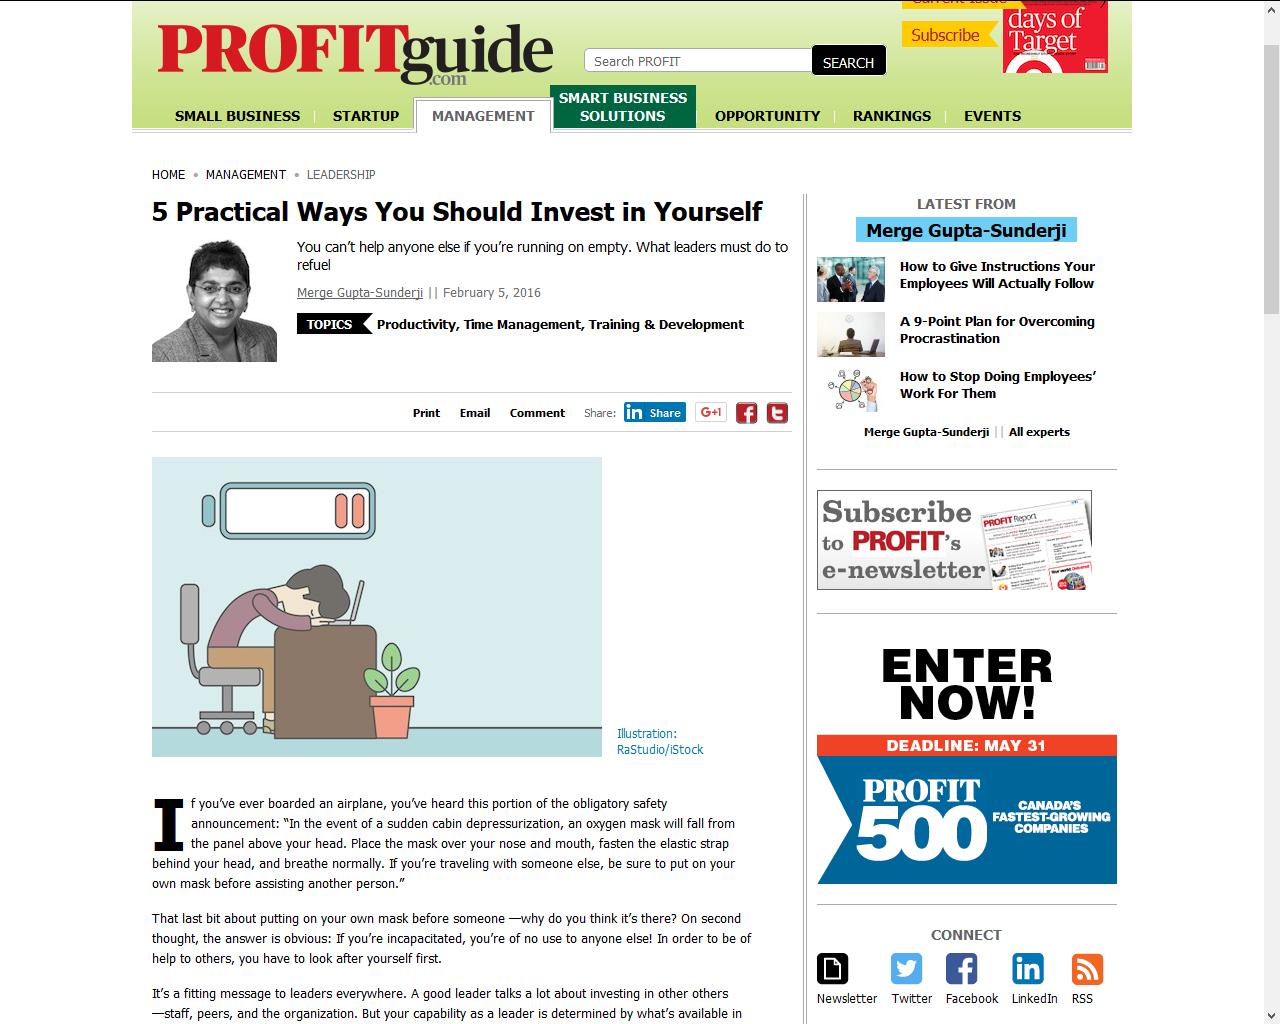 ProfitGuide020516